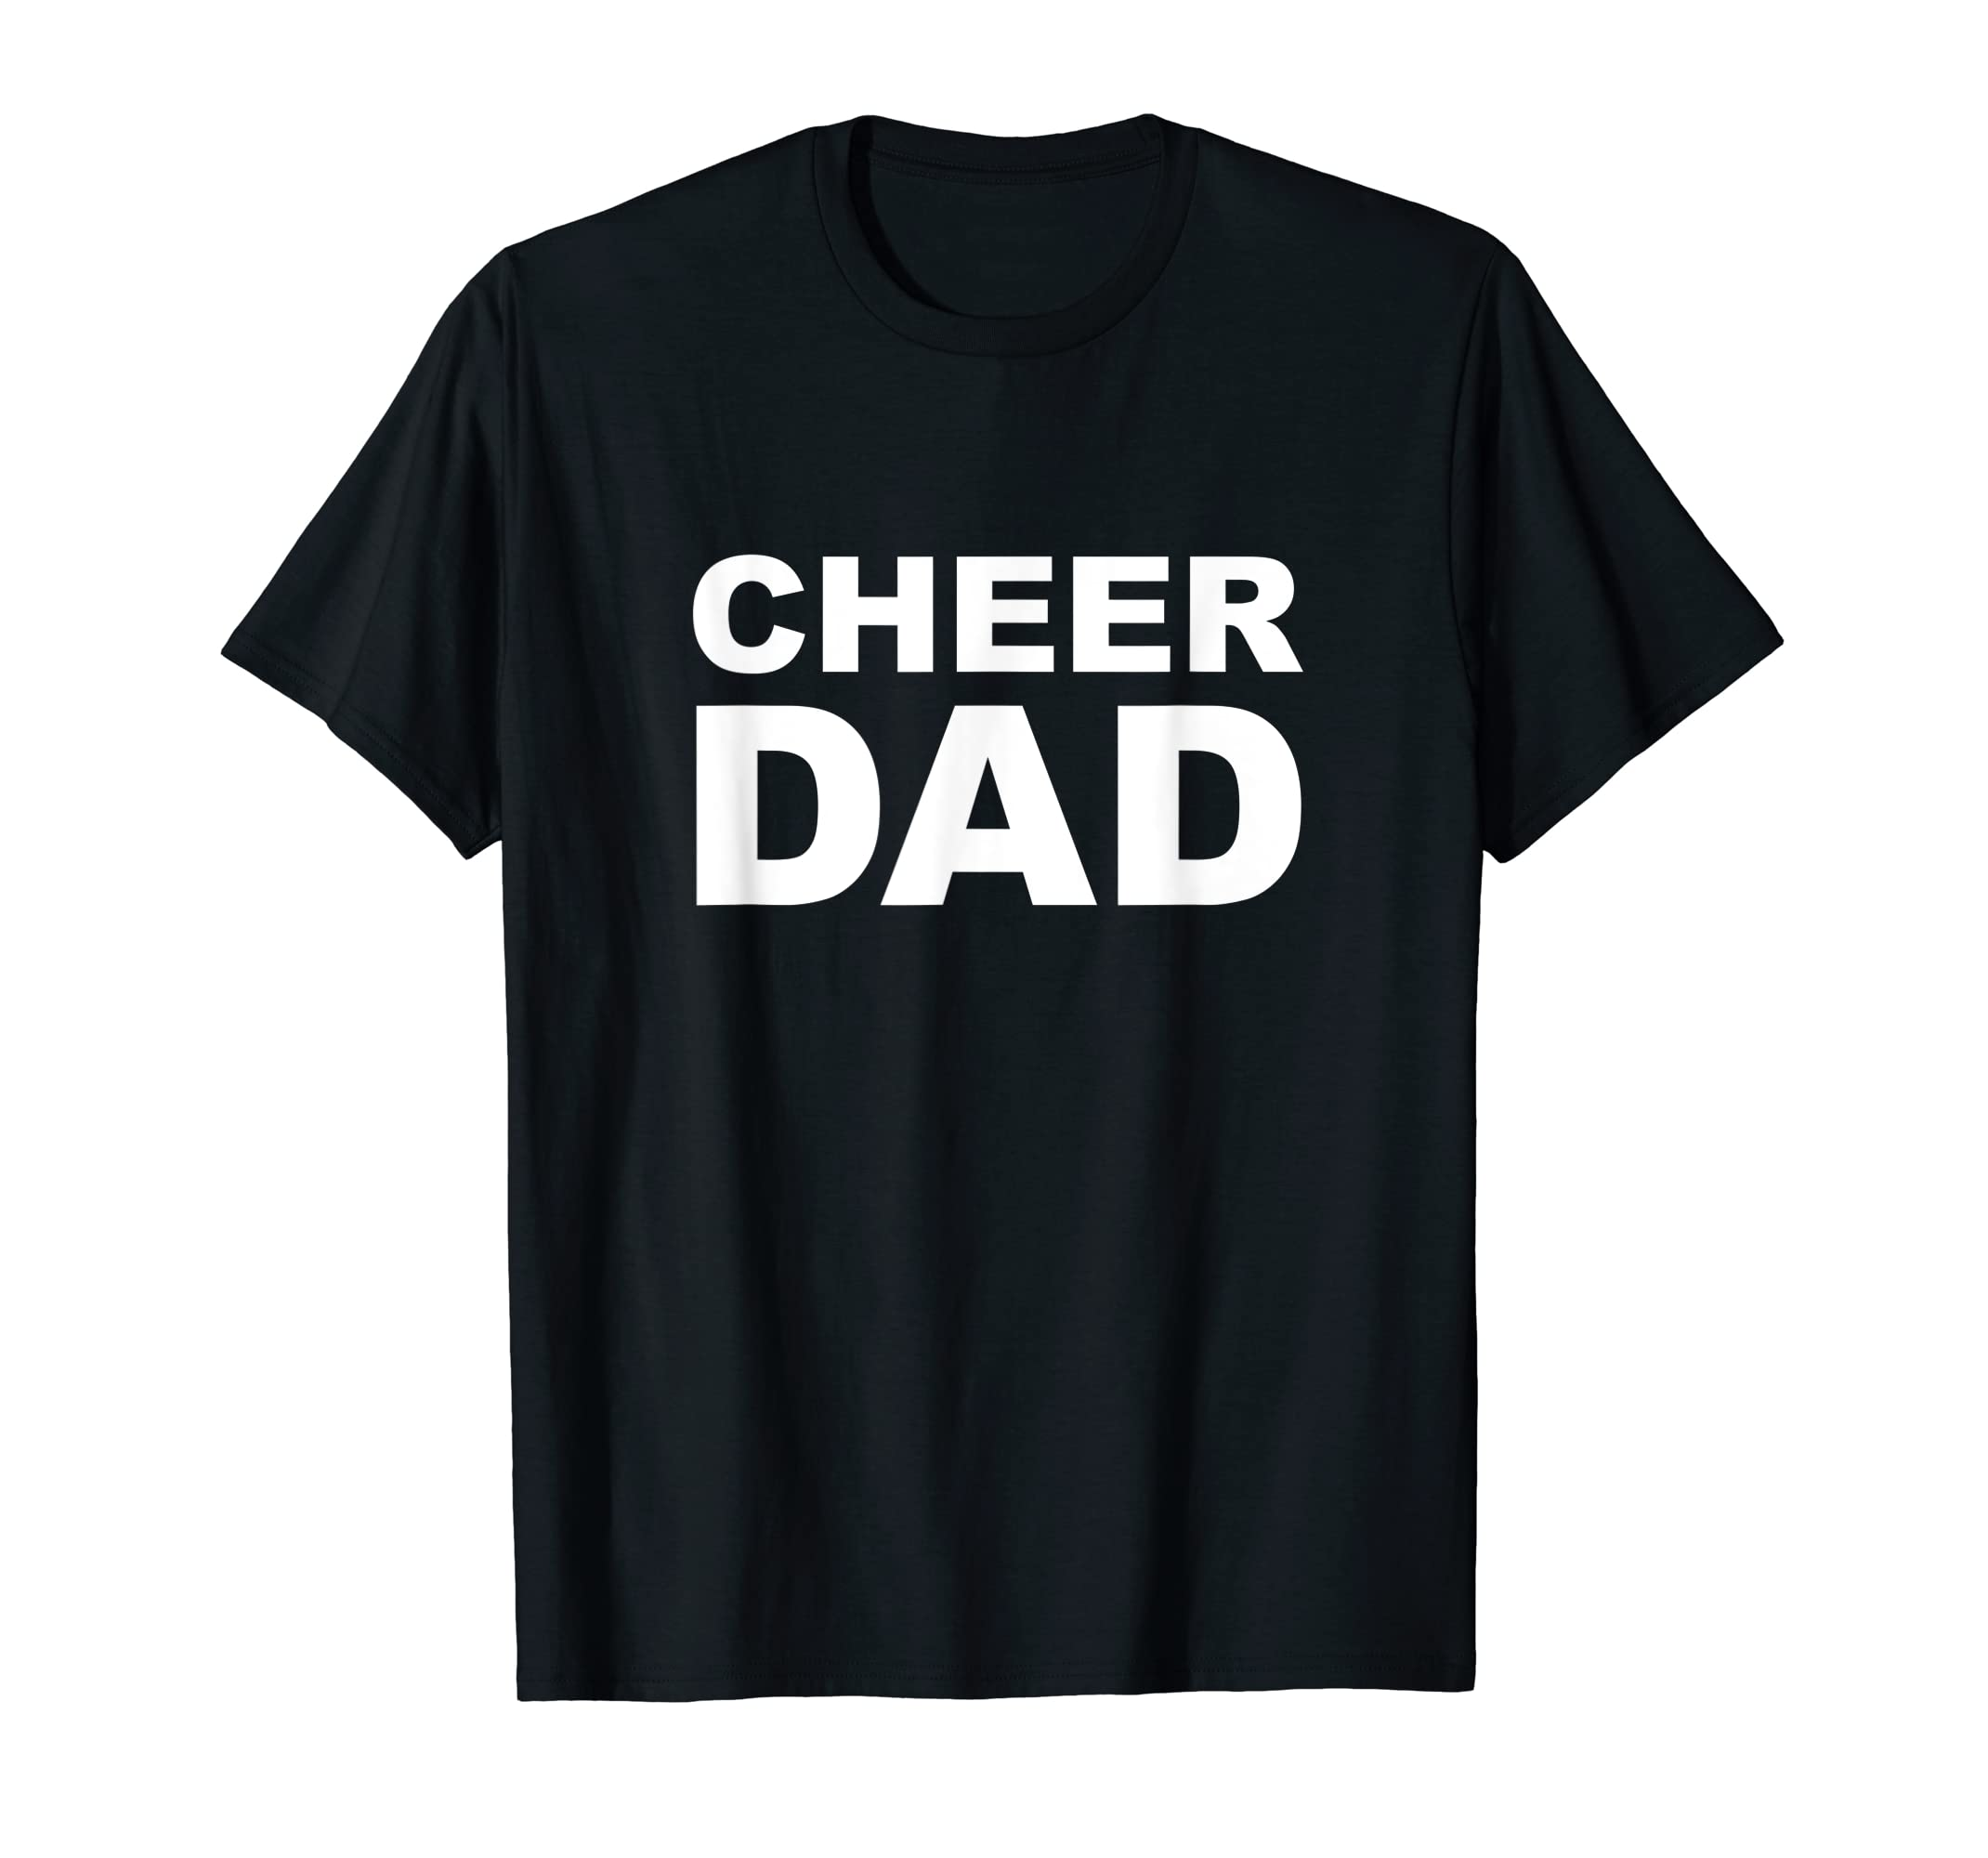 052377ea Amazon.com: Cheer Dad Shirt | T-Shirt for Cheerleader Dads: Clothing